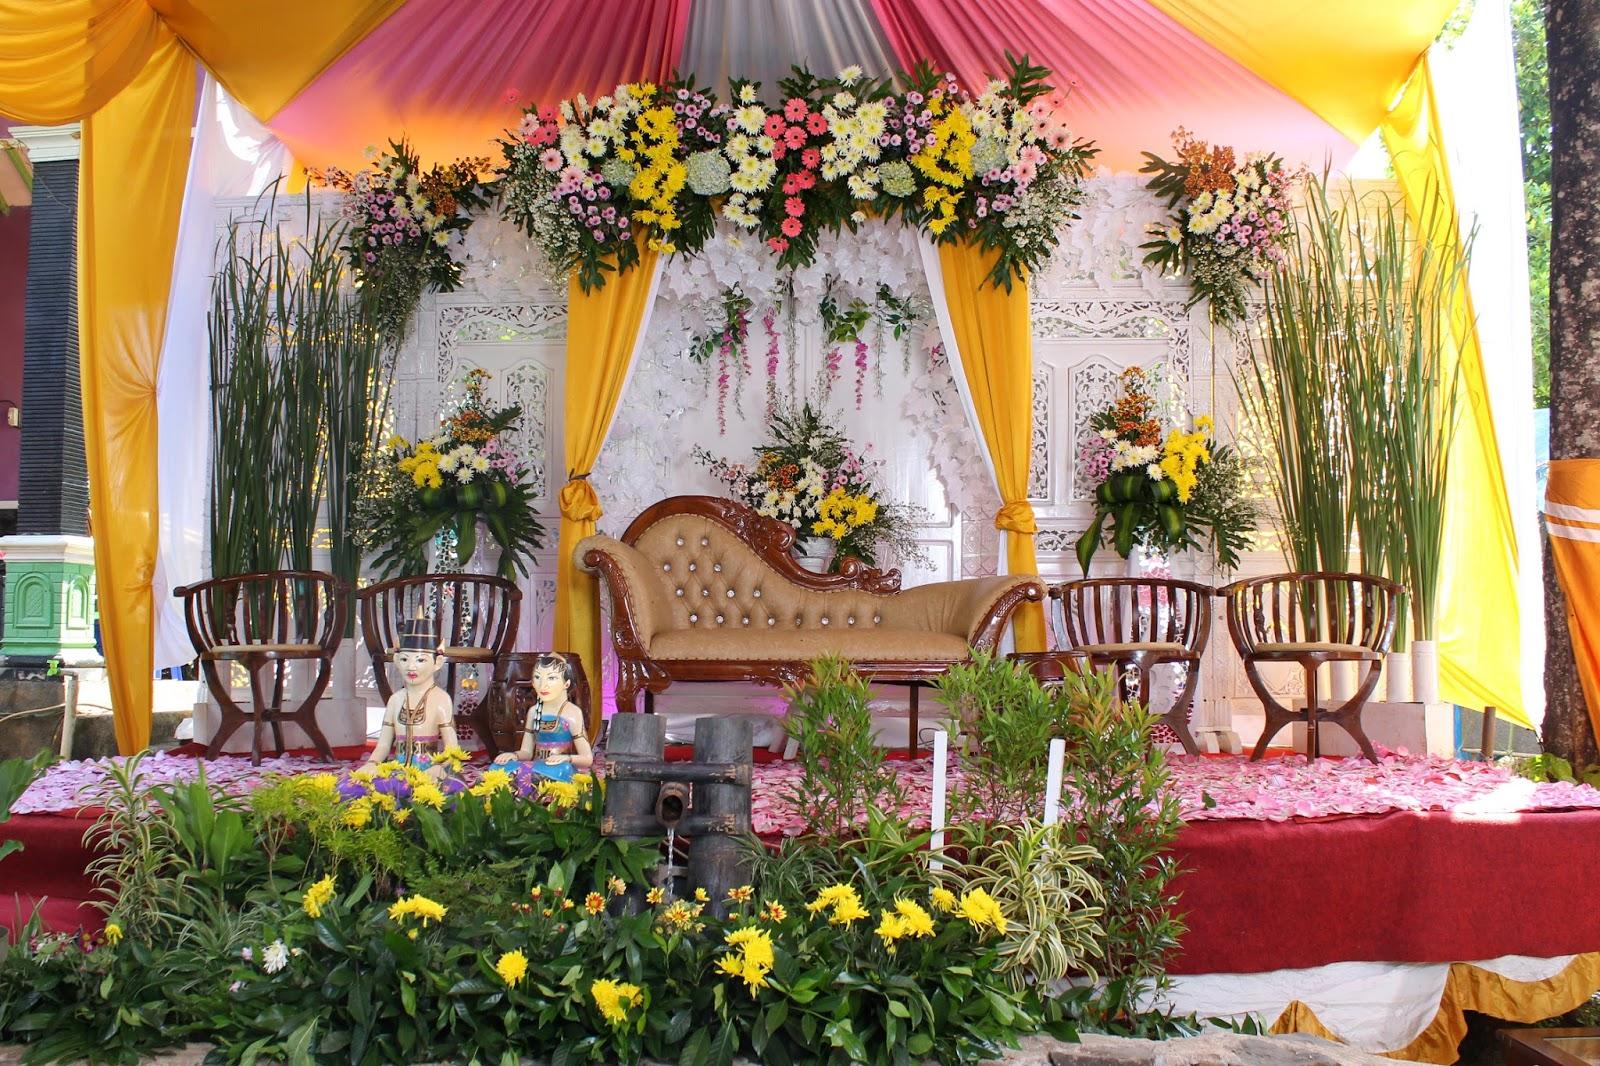 dekorasi pengantin semarang salatiga